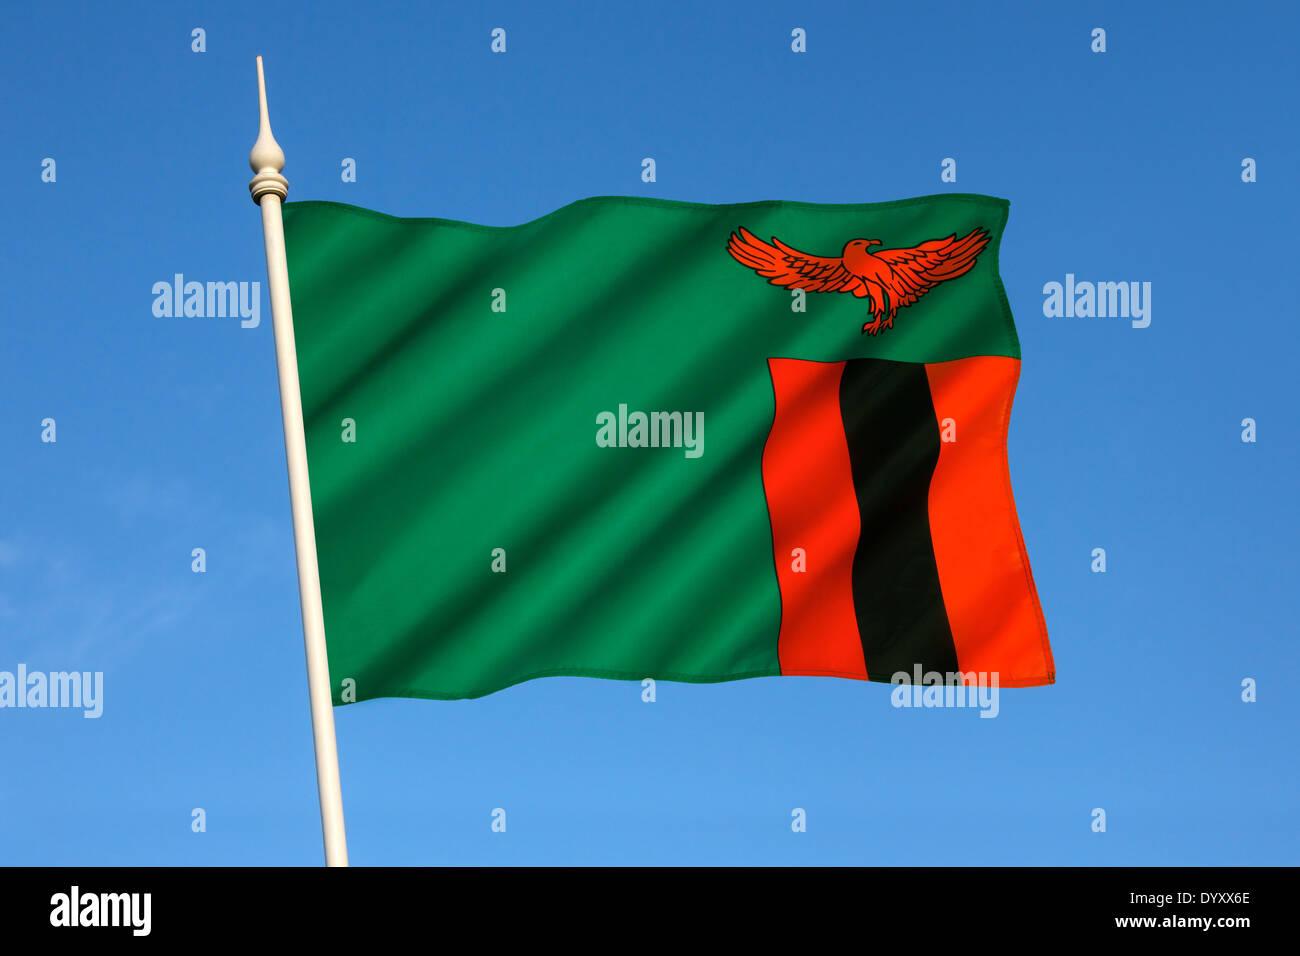 Flag of Zambia - Stock Image